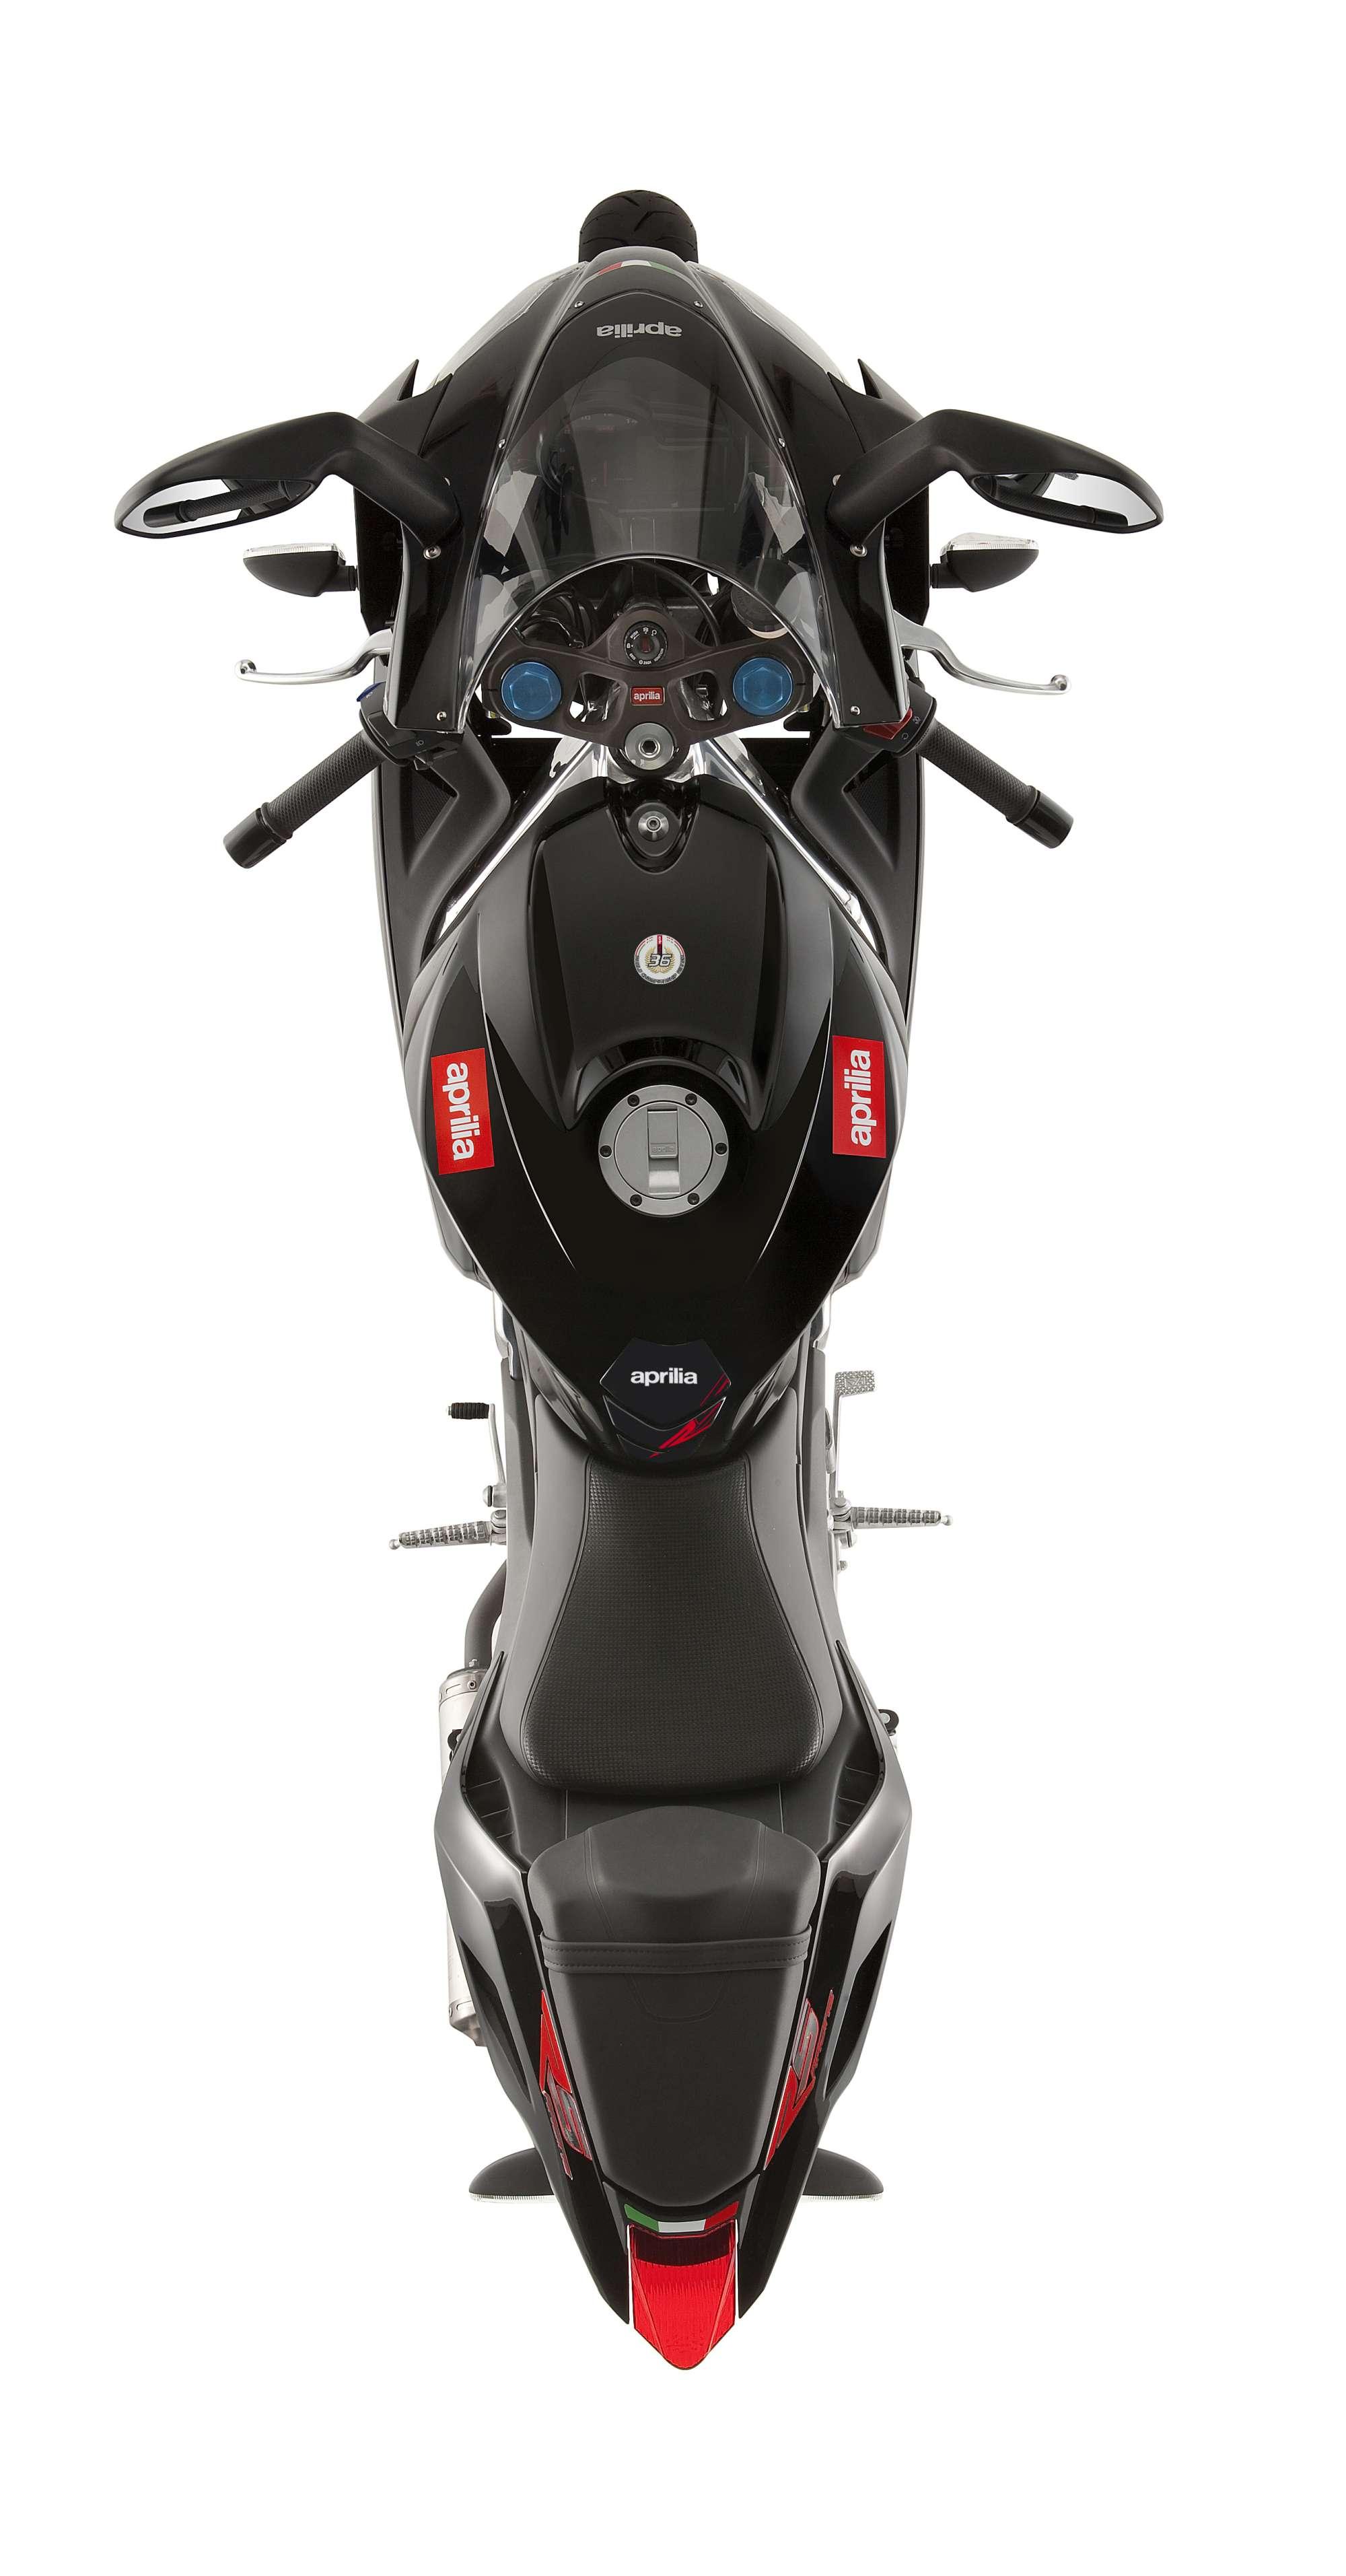 Aprilia RS 125 Racing Bilder und technische Daten